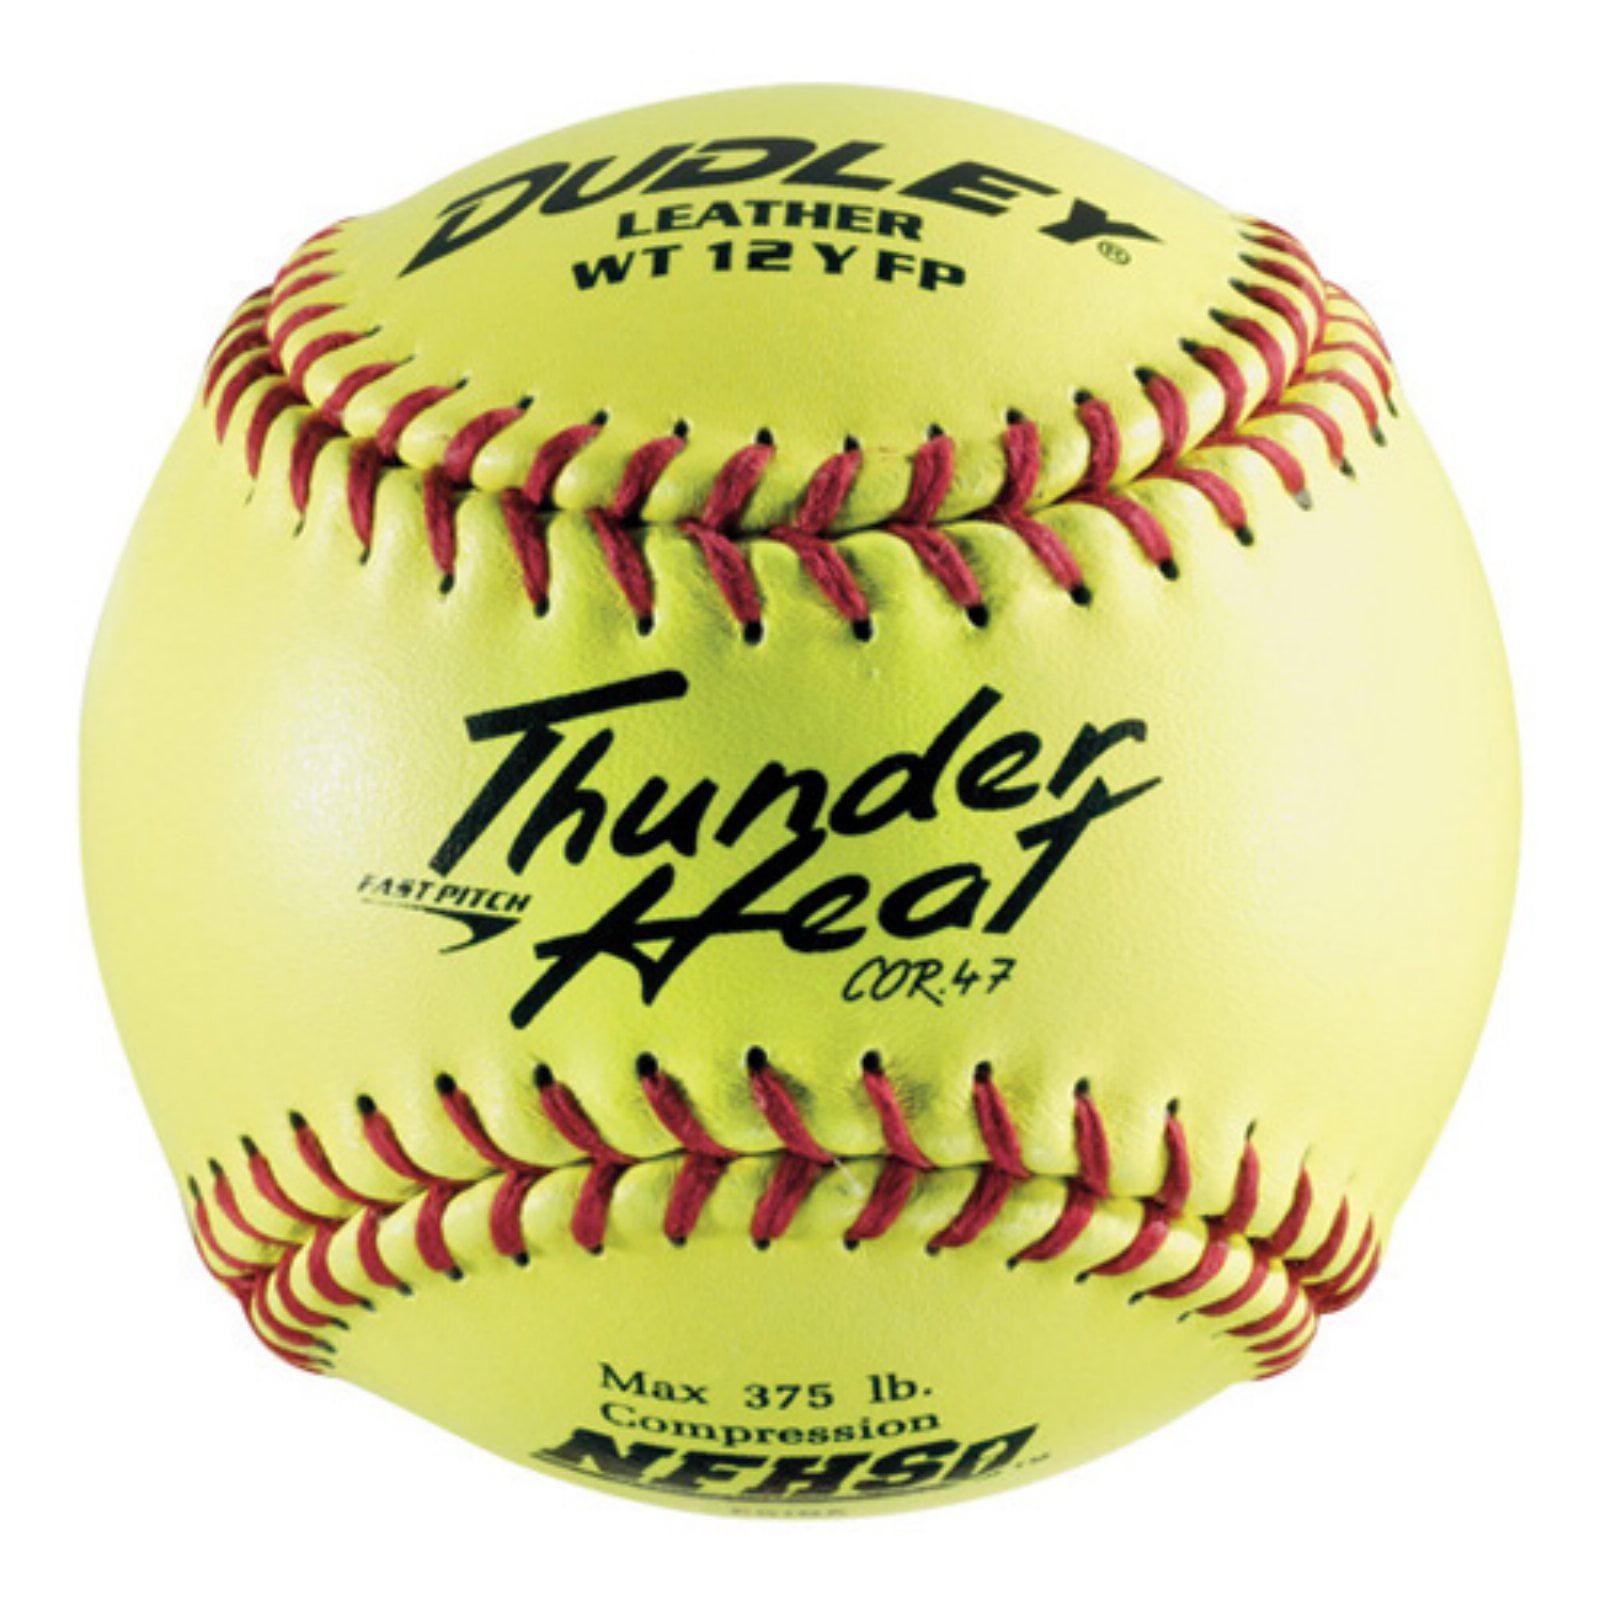 Dudley WT12Y-FP NFHS 12 in. Fastpitch Softballs - 1 Dozen